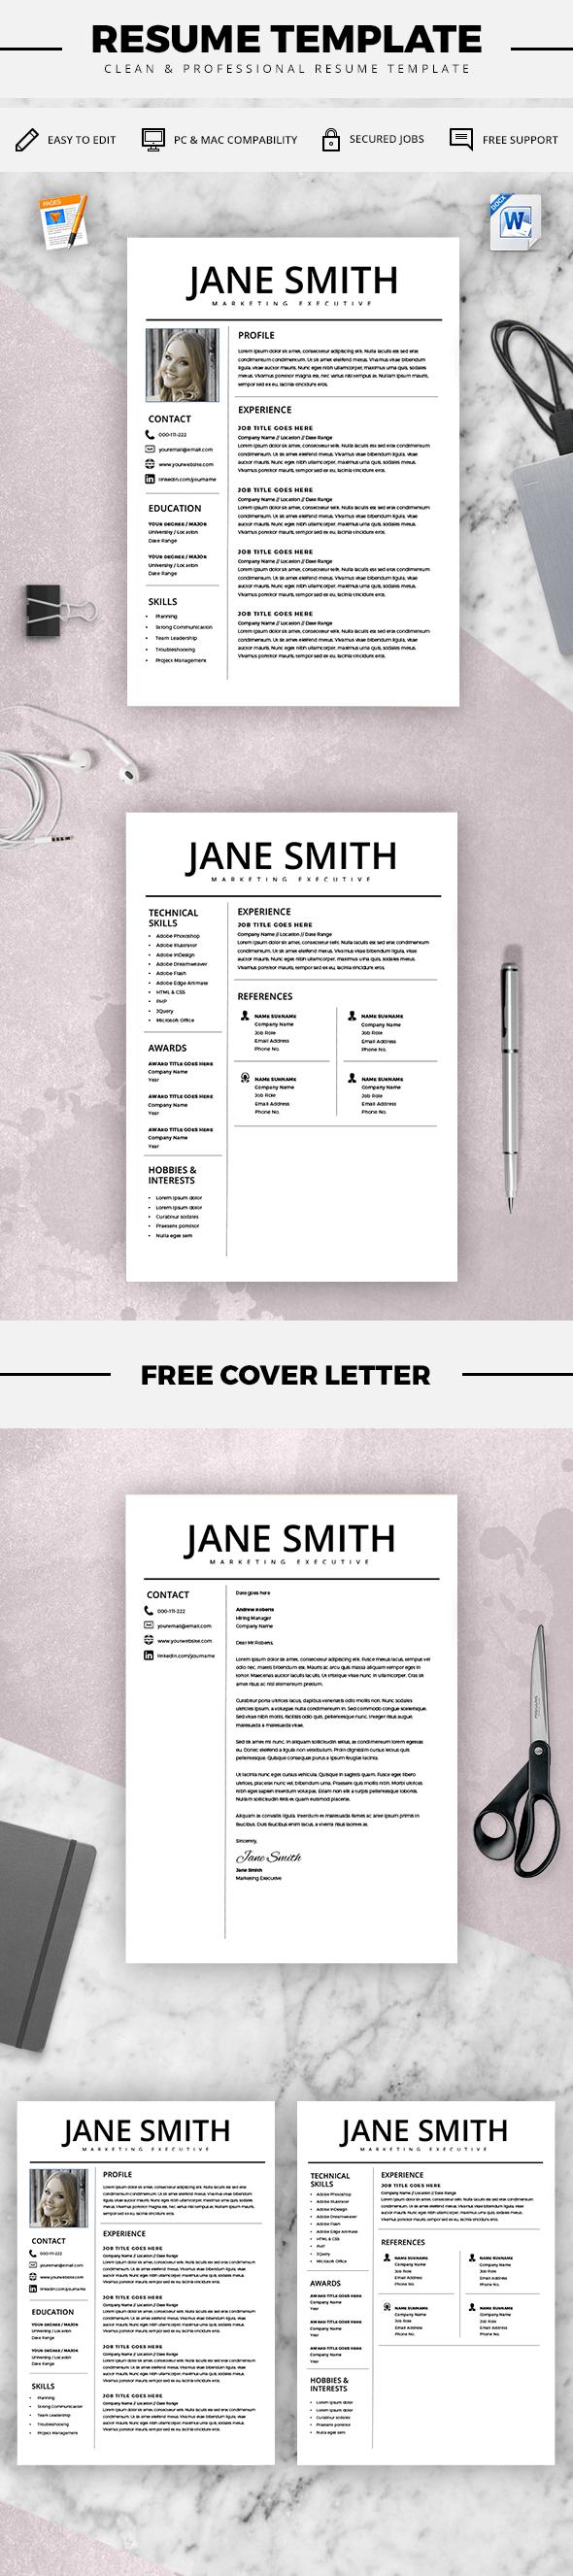 microsoft compatible resume templates